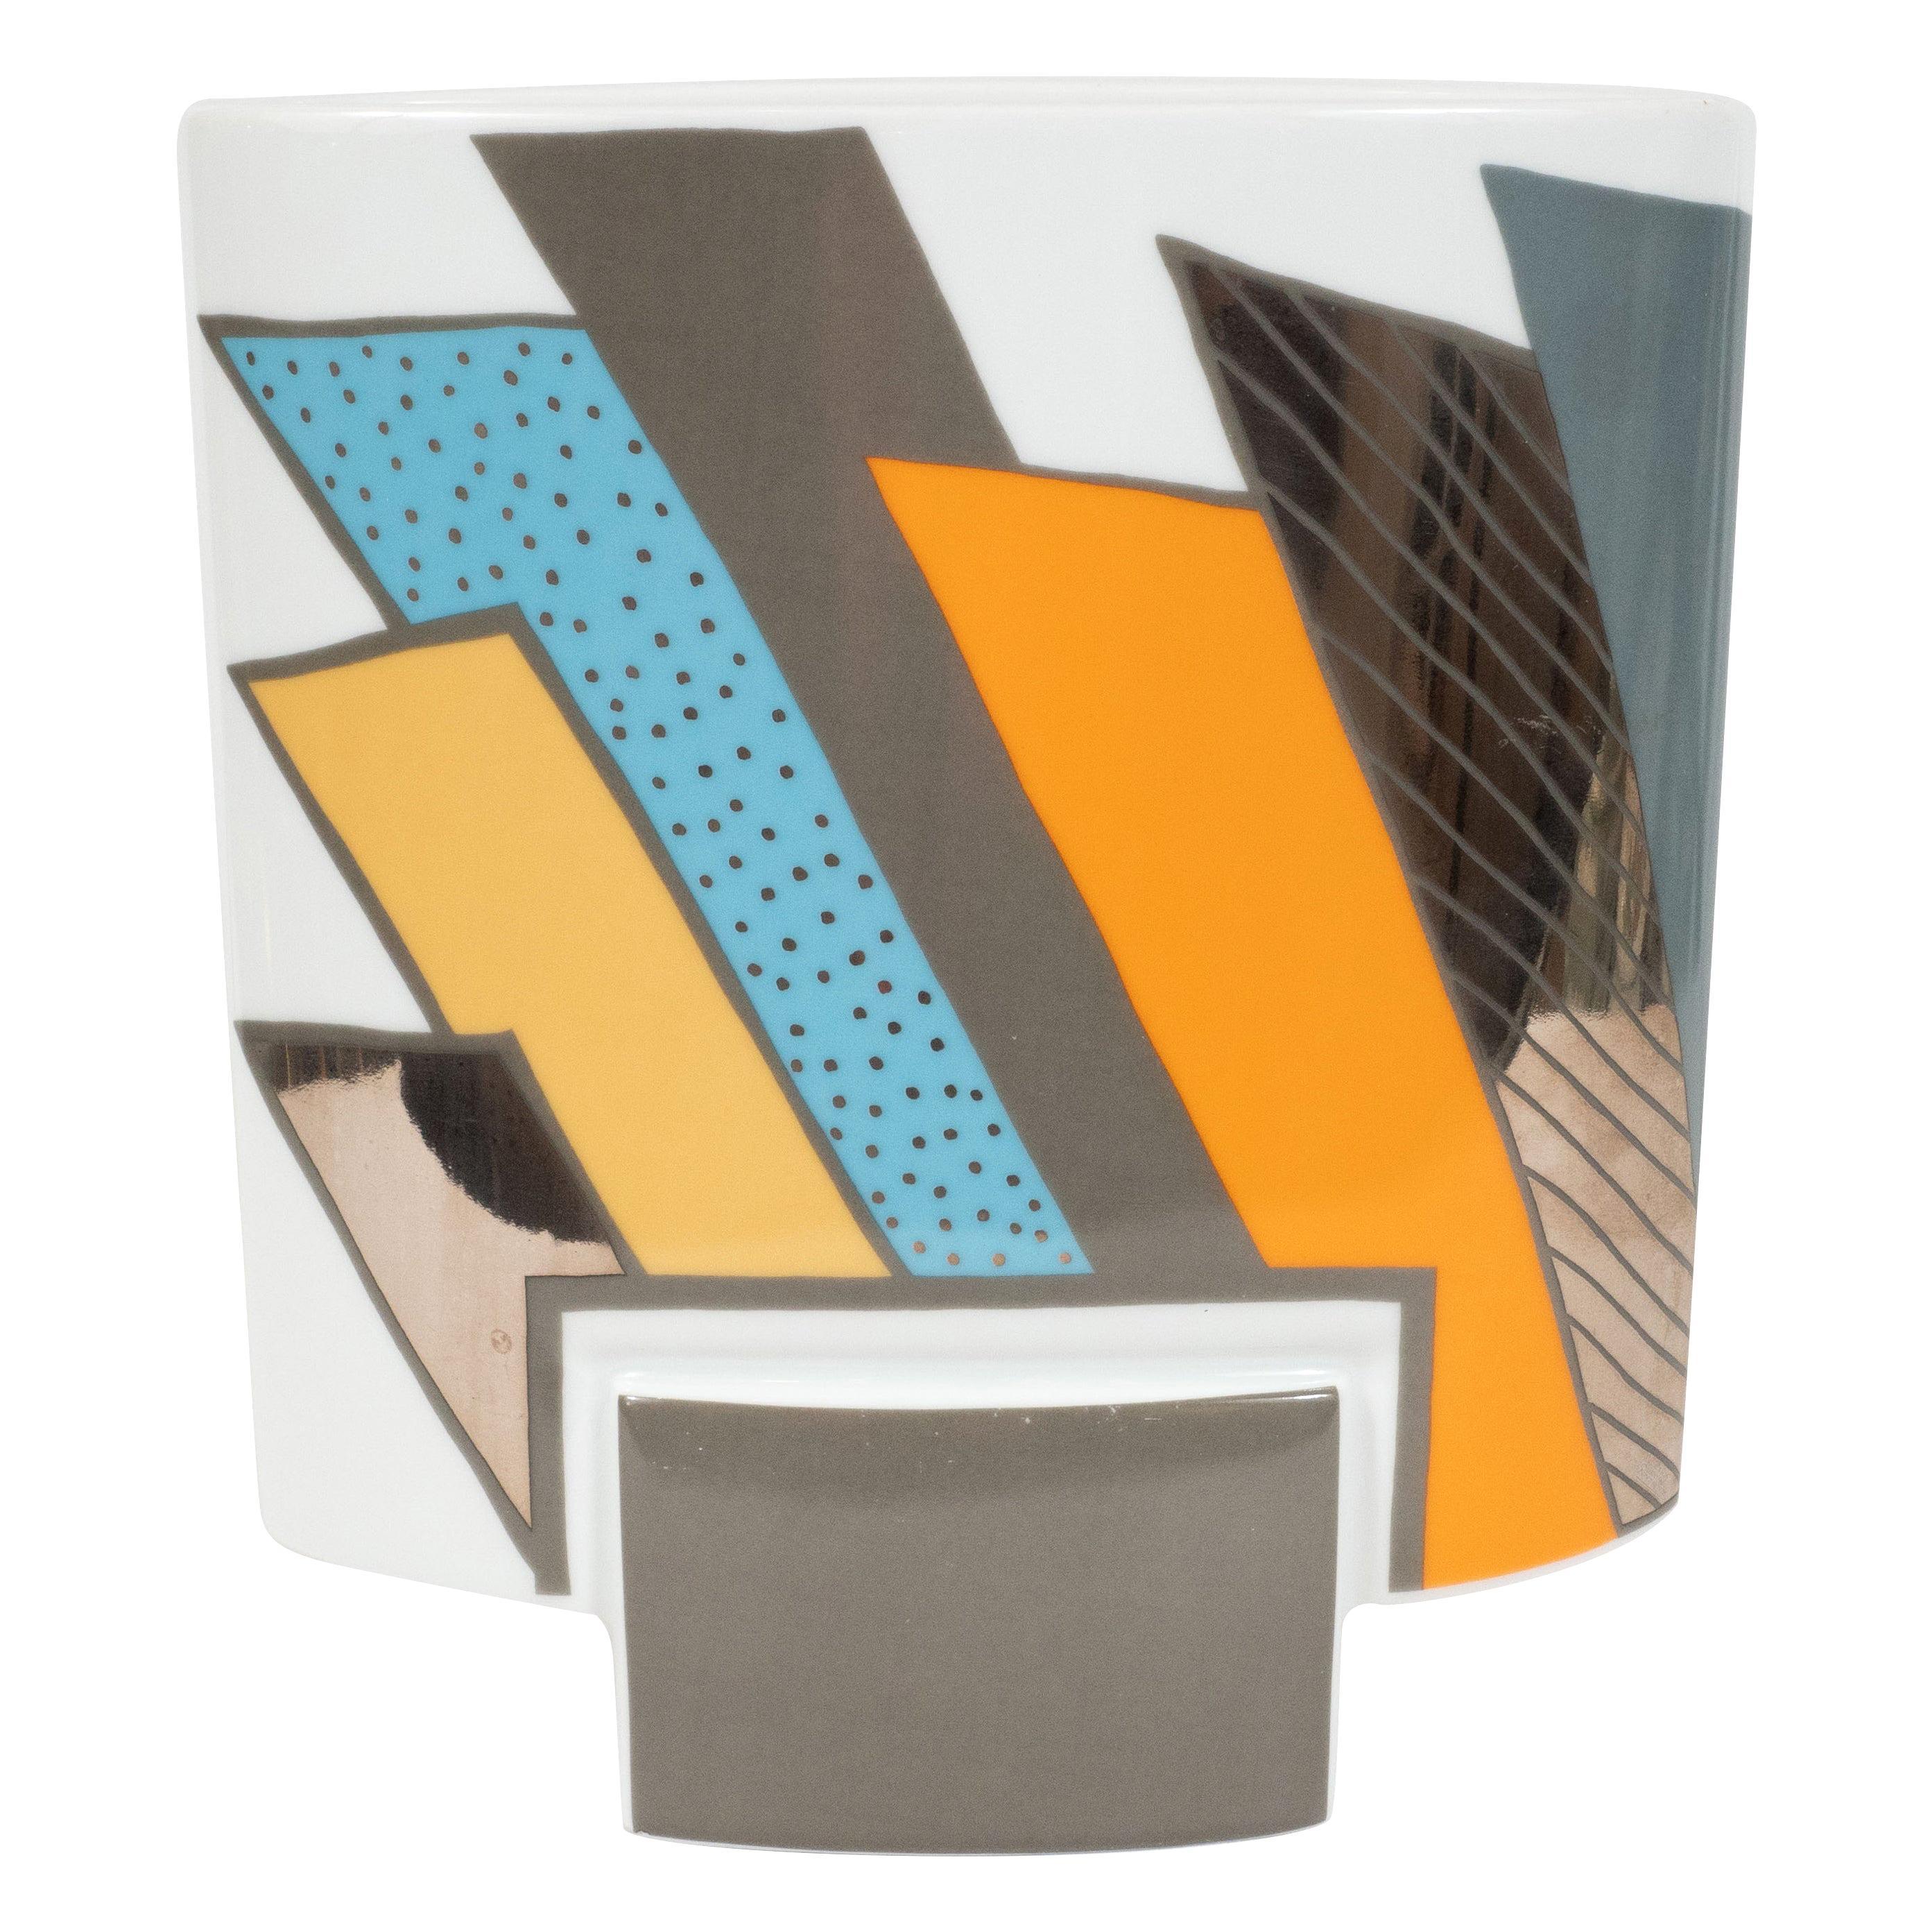 Midcentury Porcelain Vase by Michael Boehm & Rosemonde Nairac for Rosenthal